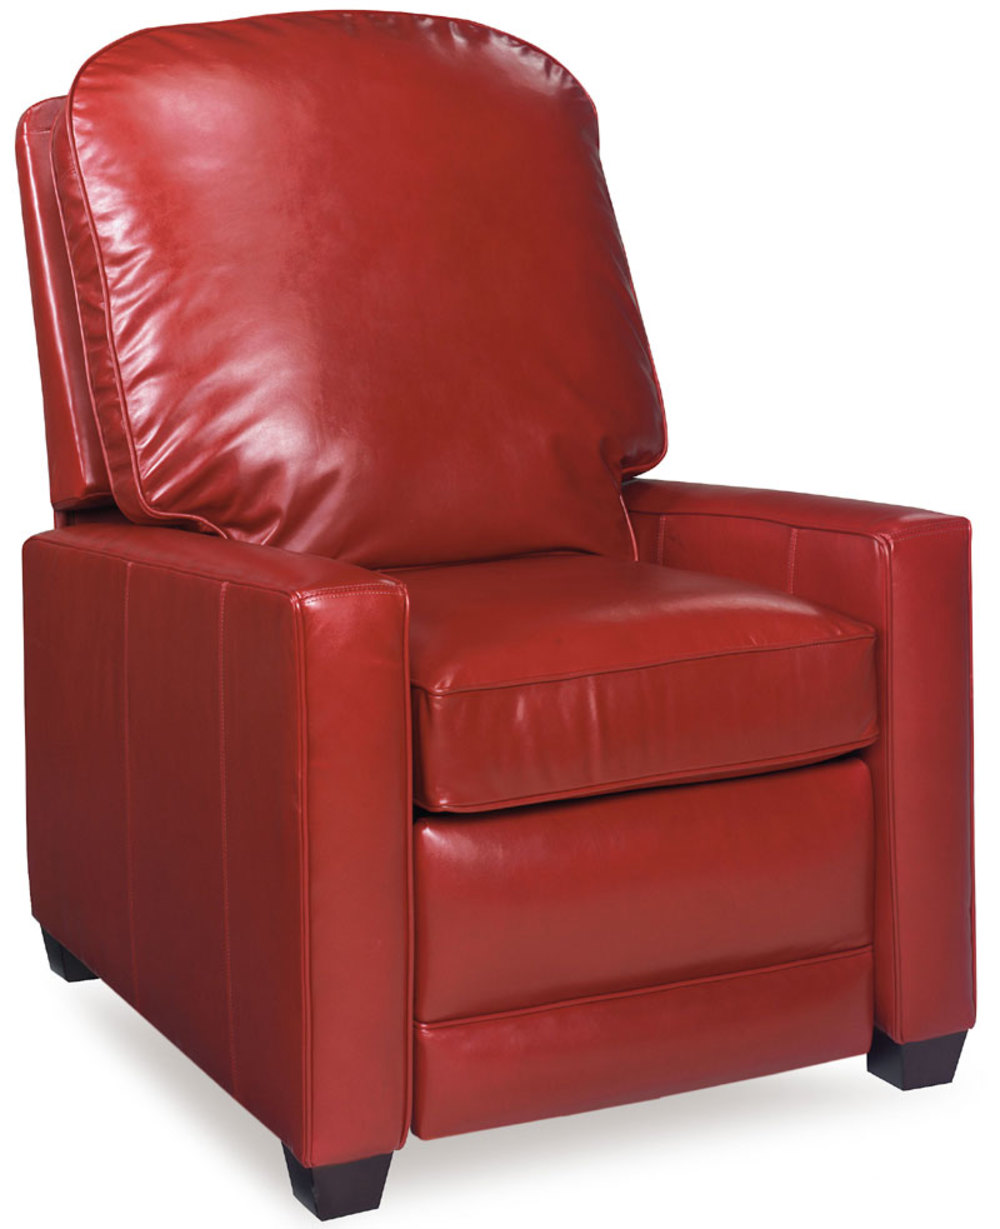 Temple Furniture - Dalton Recliner